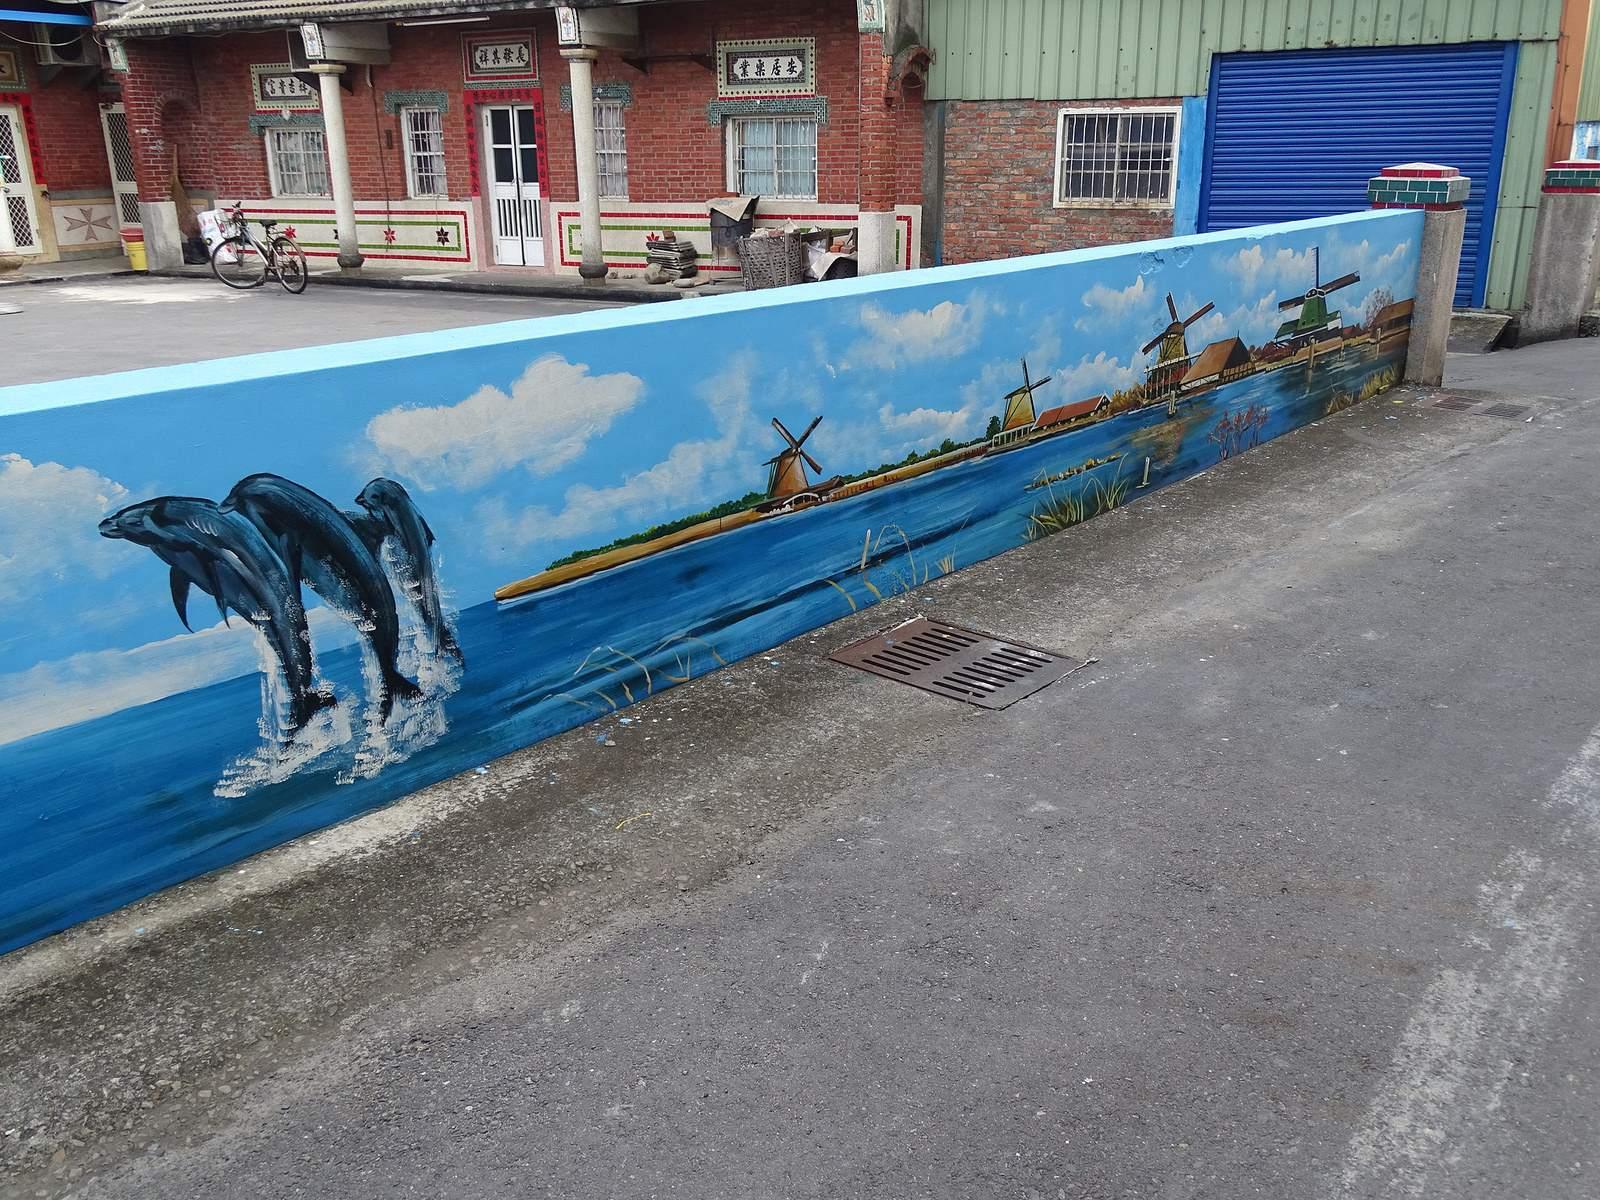 painted village23 Painted Fubao Village in Changhua